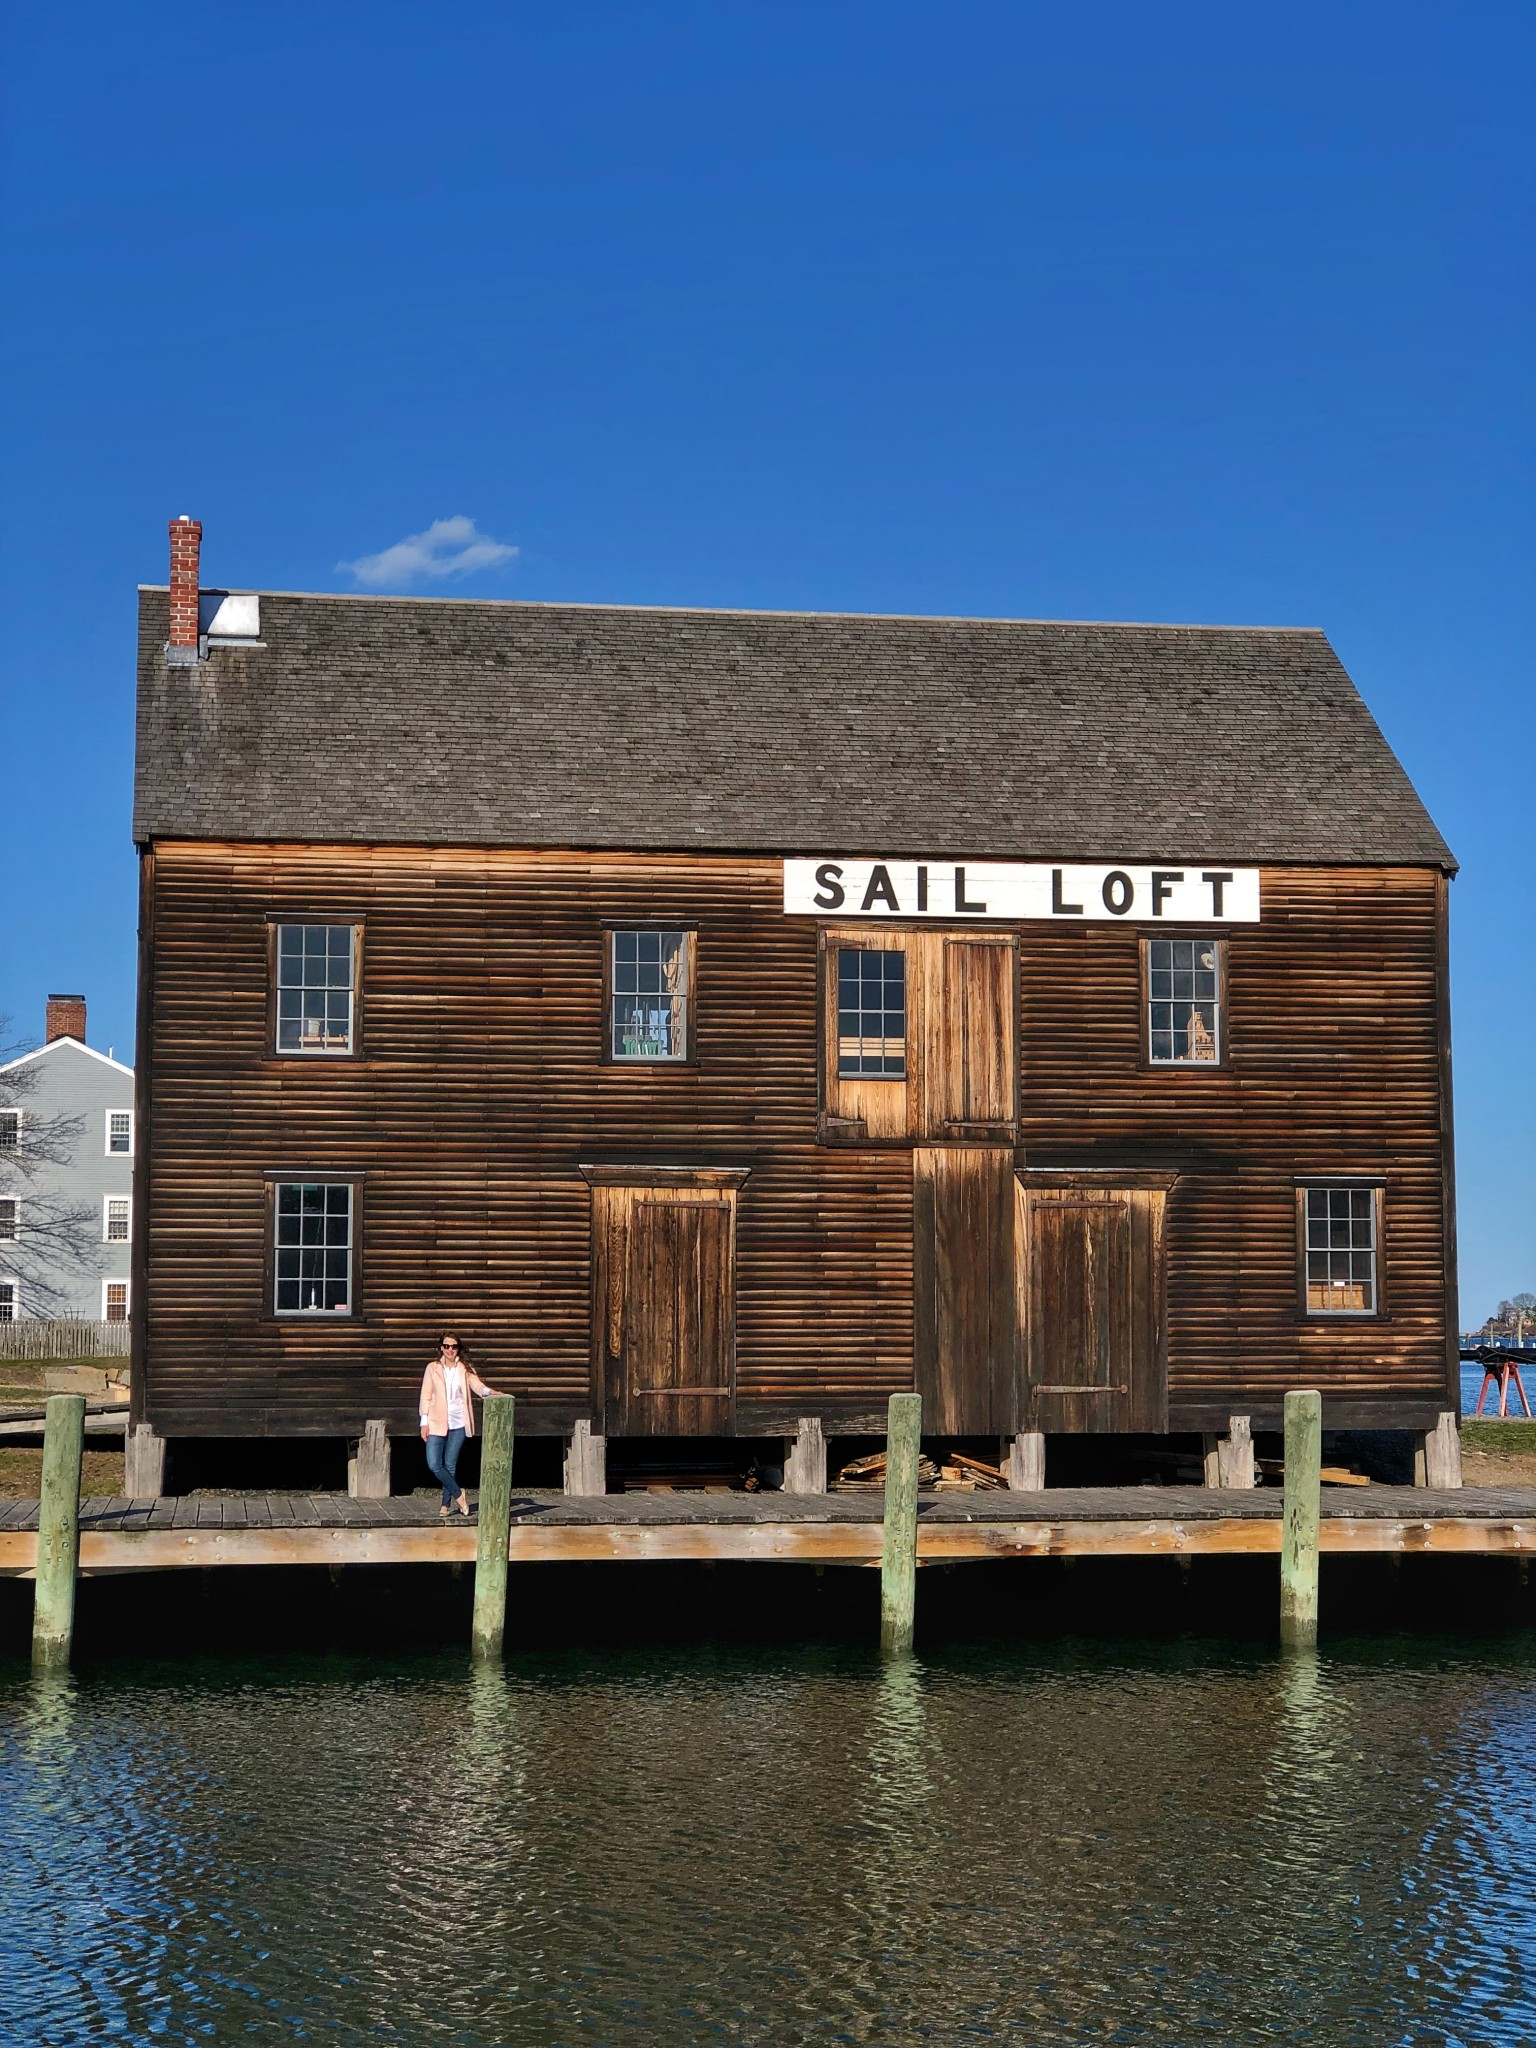 sail loft, derby wharf, salem, massachusetts, the-alyst.com